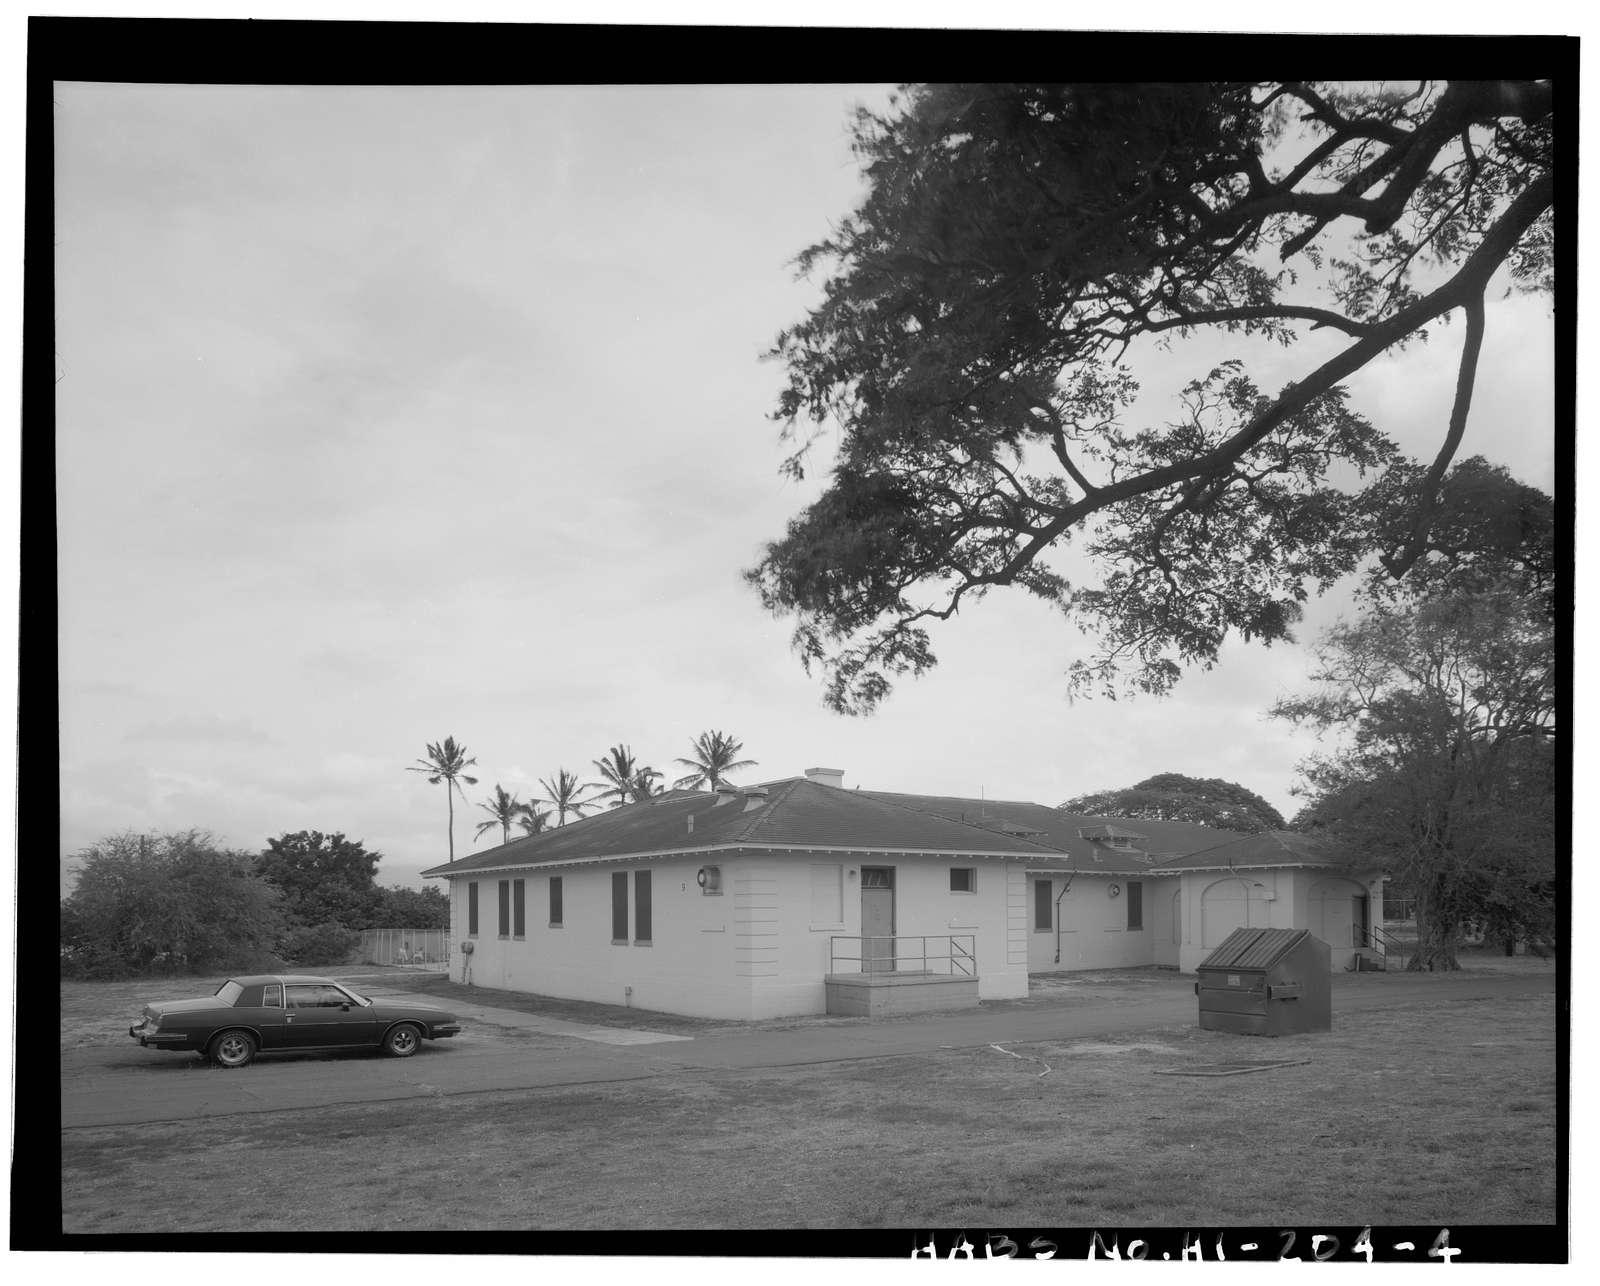 Naval Magazine Lualualei, West Loch Branch, Special Services Center-Gymnasium, Arizona Loop, Pearl City, Honolulu County, HI